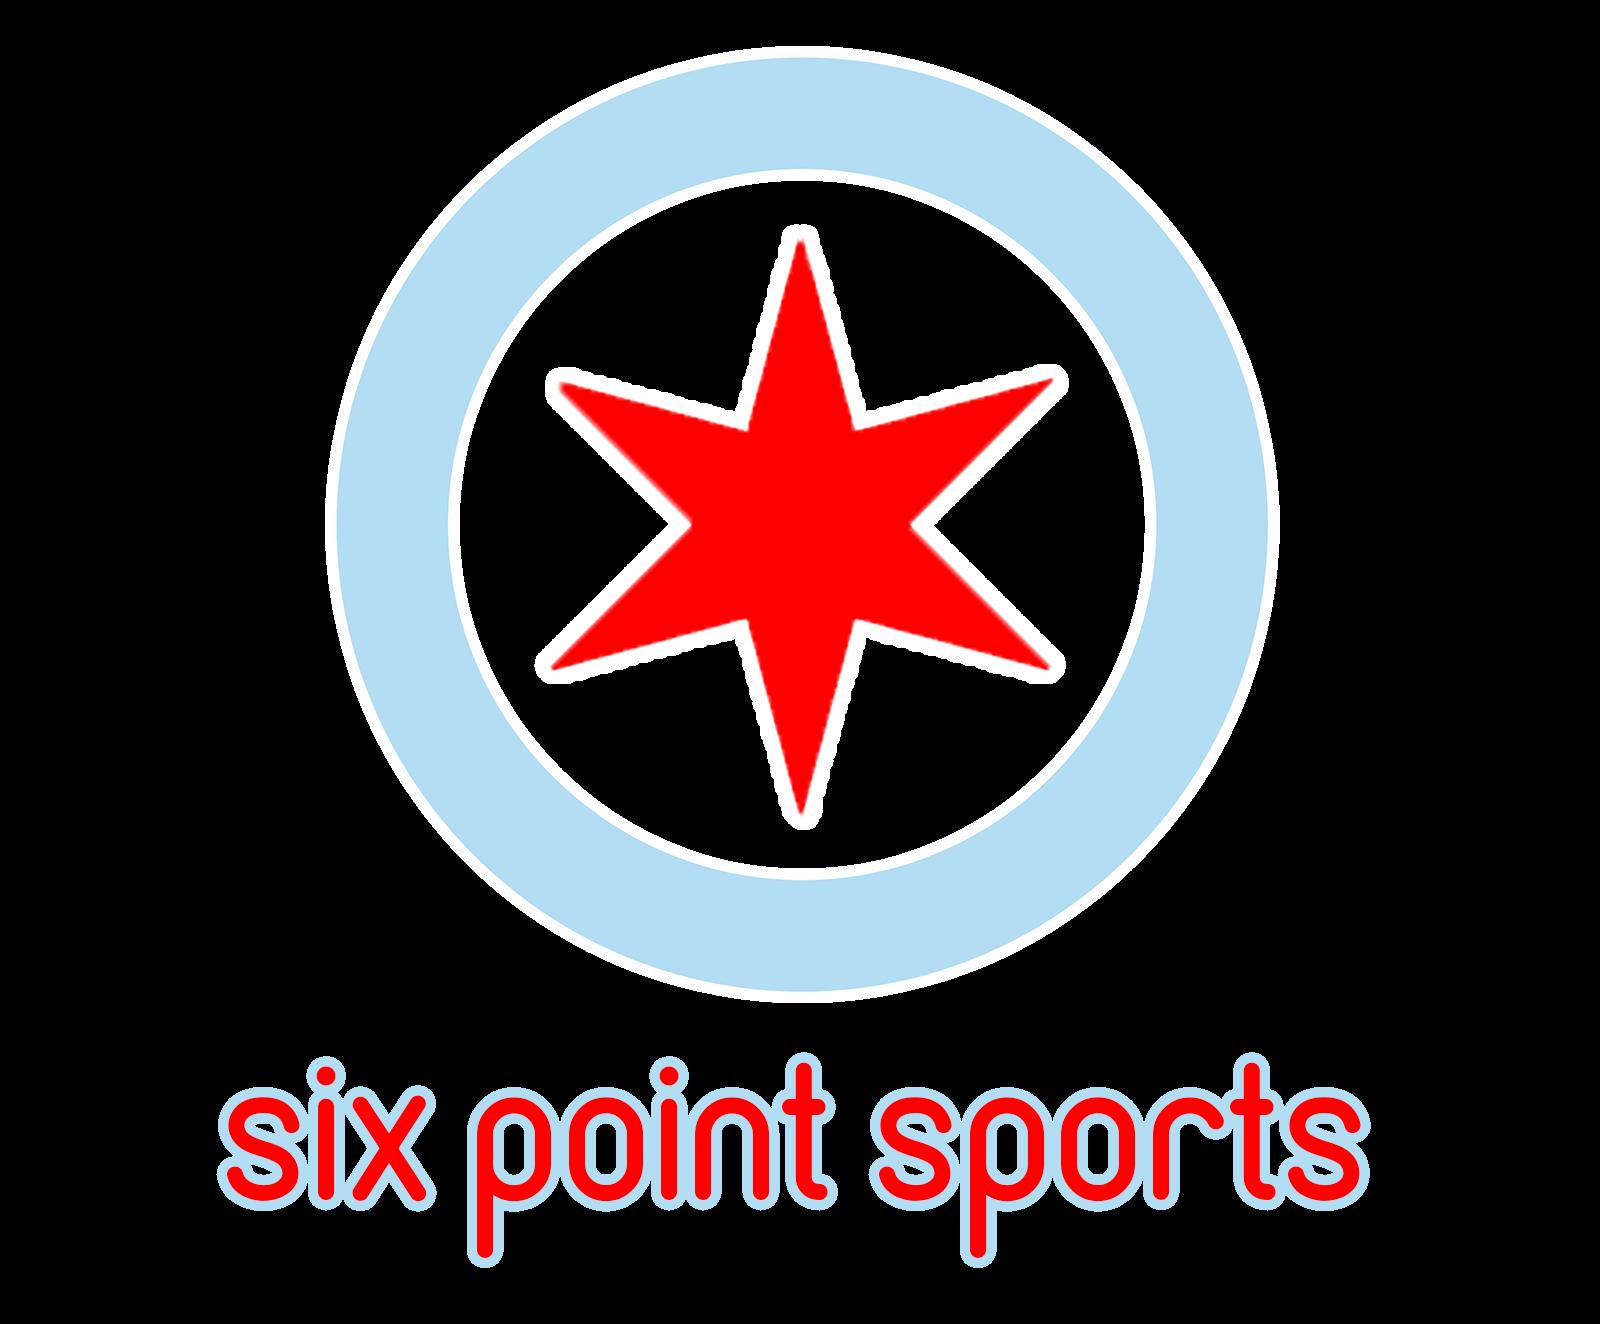 Six Point Sports